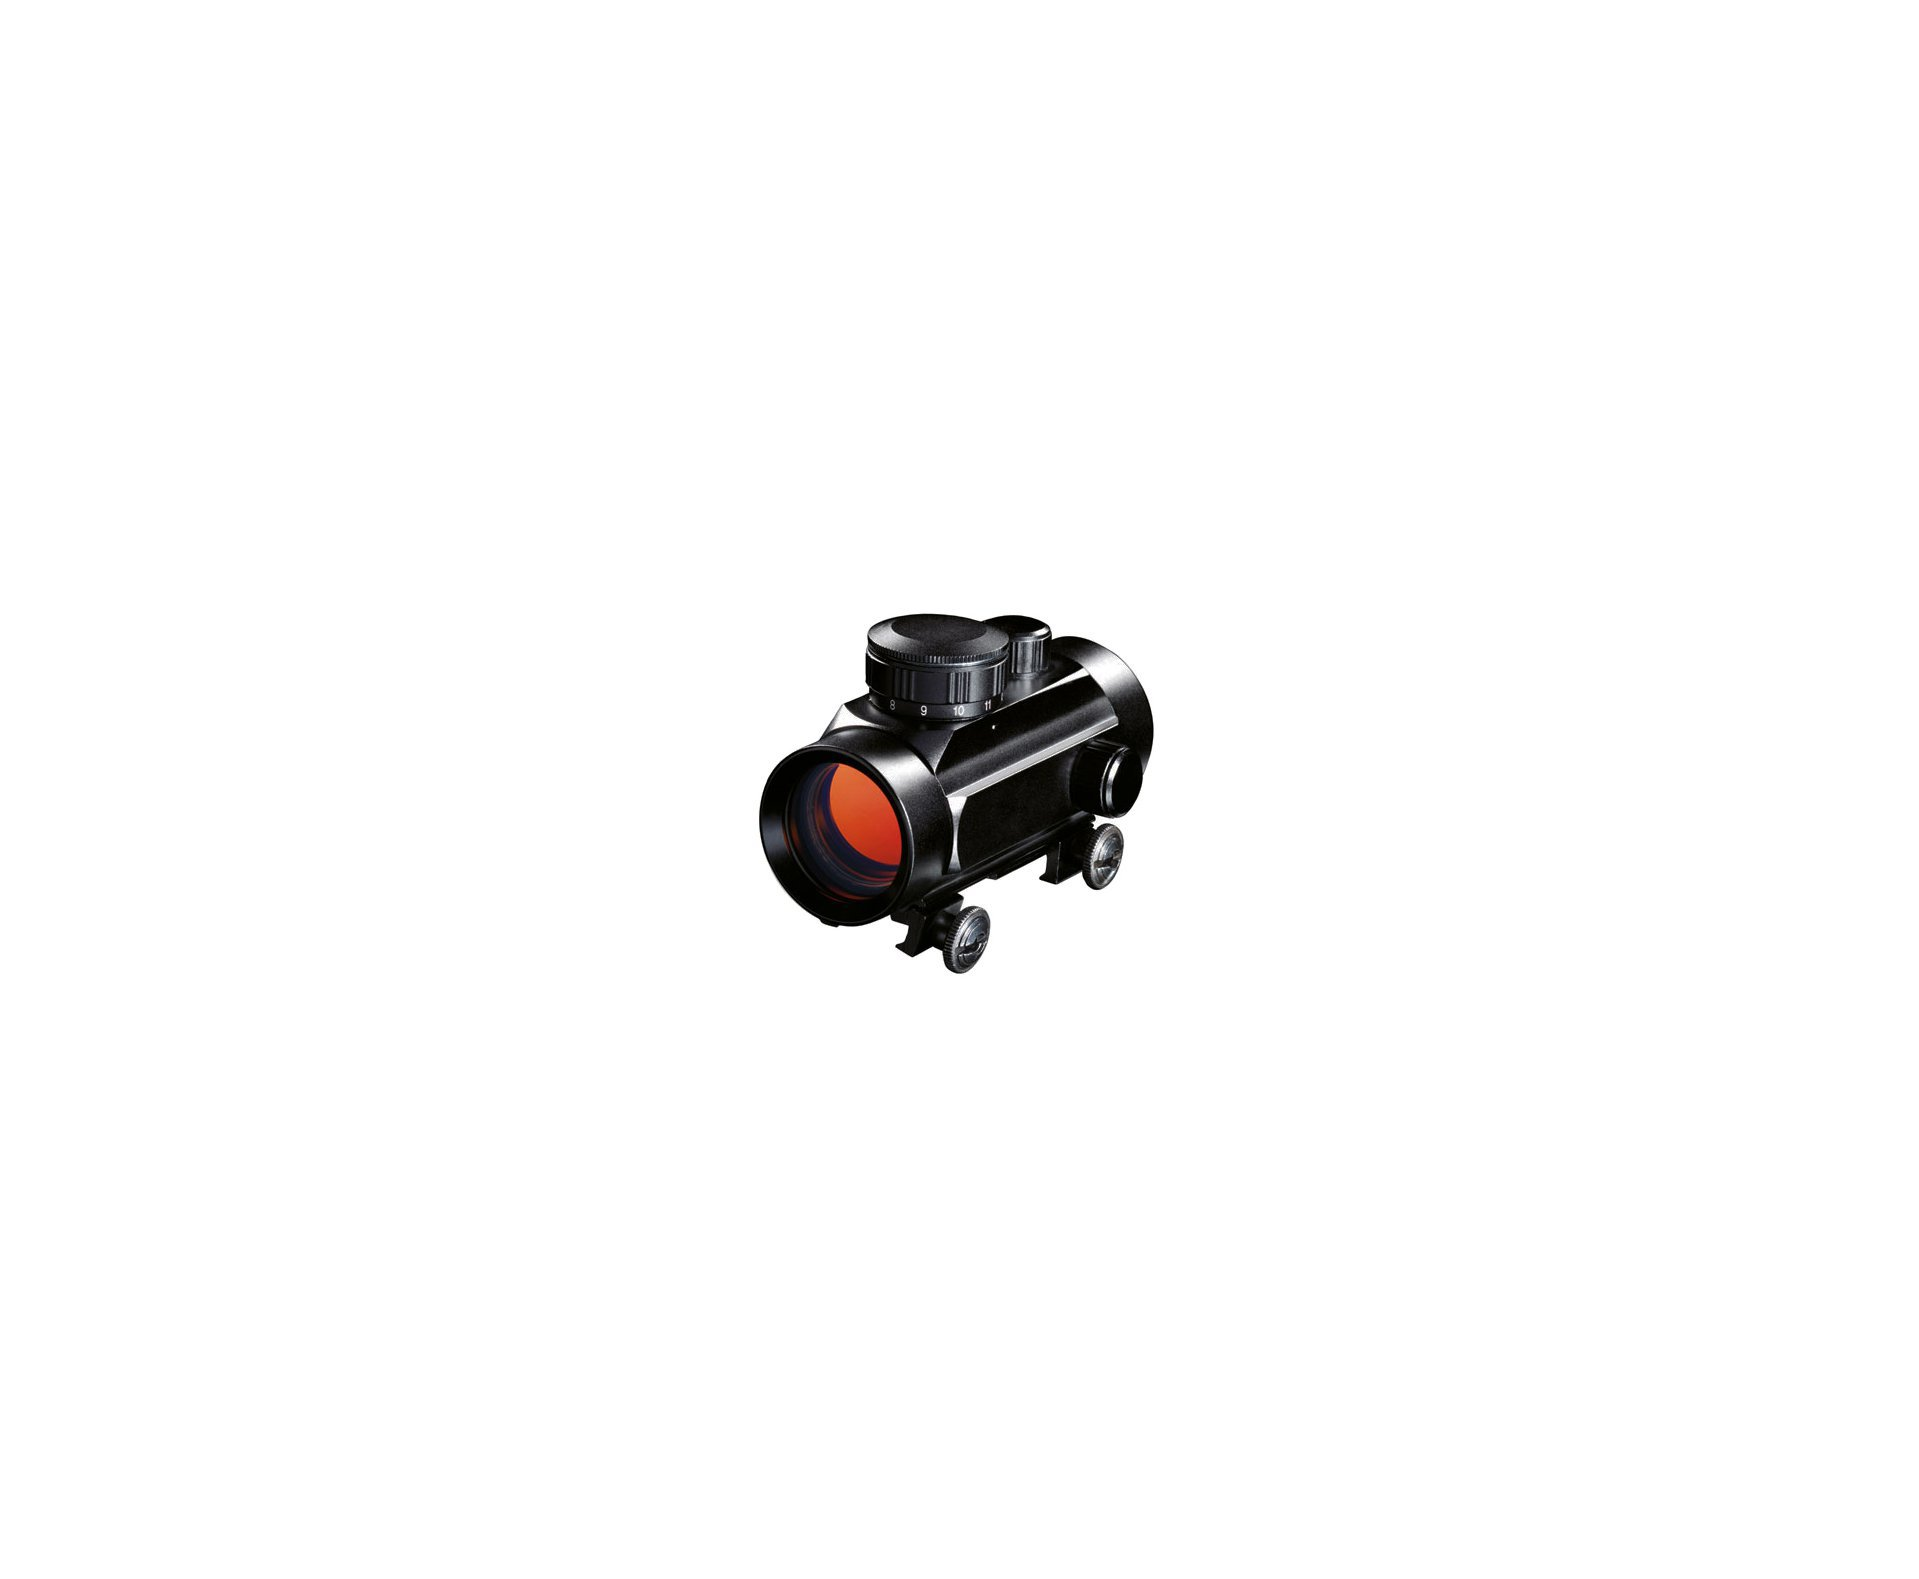 Carabina De Pressão Hatsan Ht 80 Sas 5,5 Mm + Red Dot 1x30 + Capa Rossi